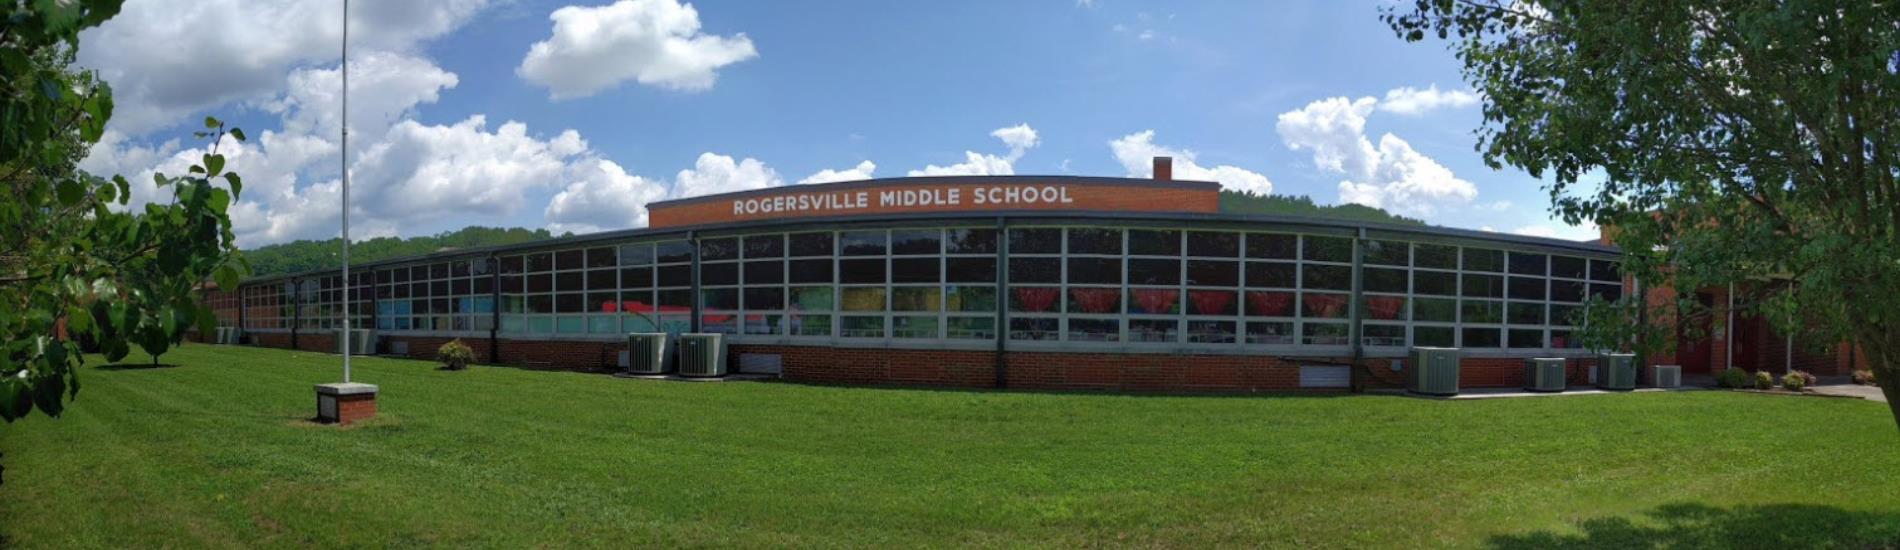 rogersville middle school building